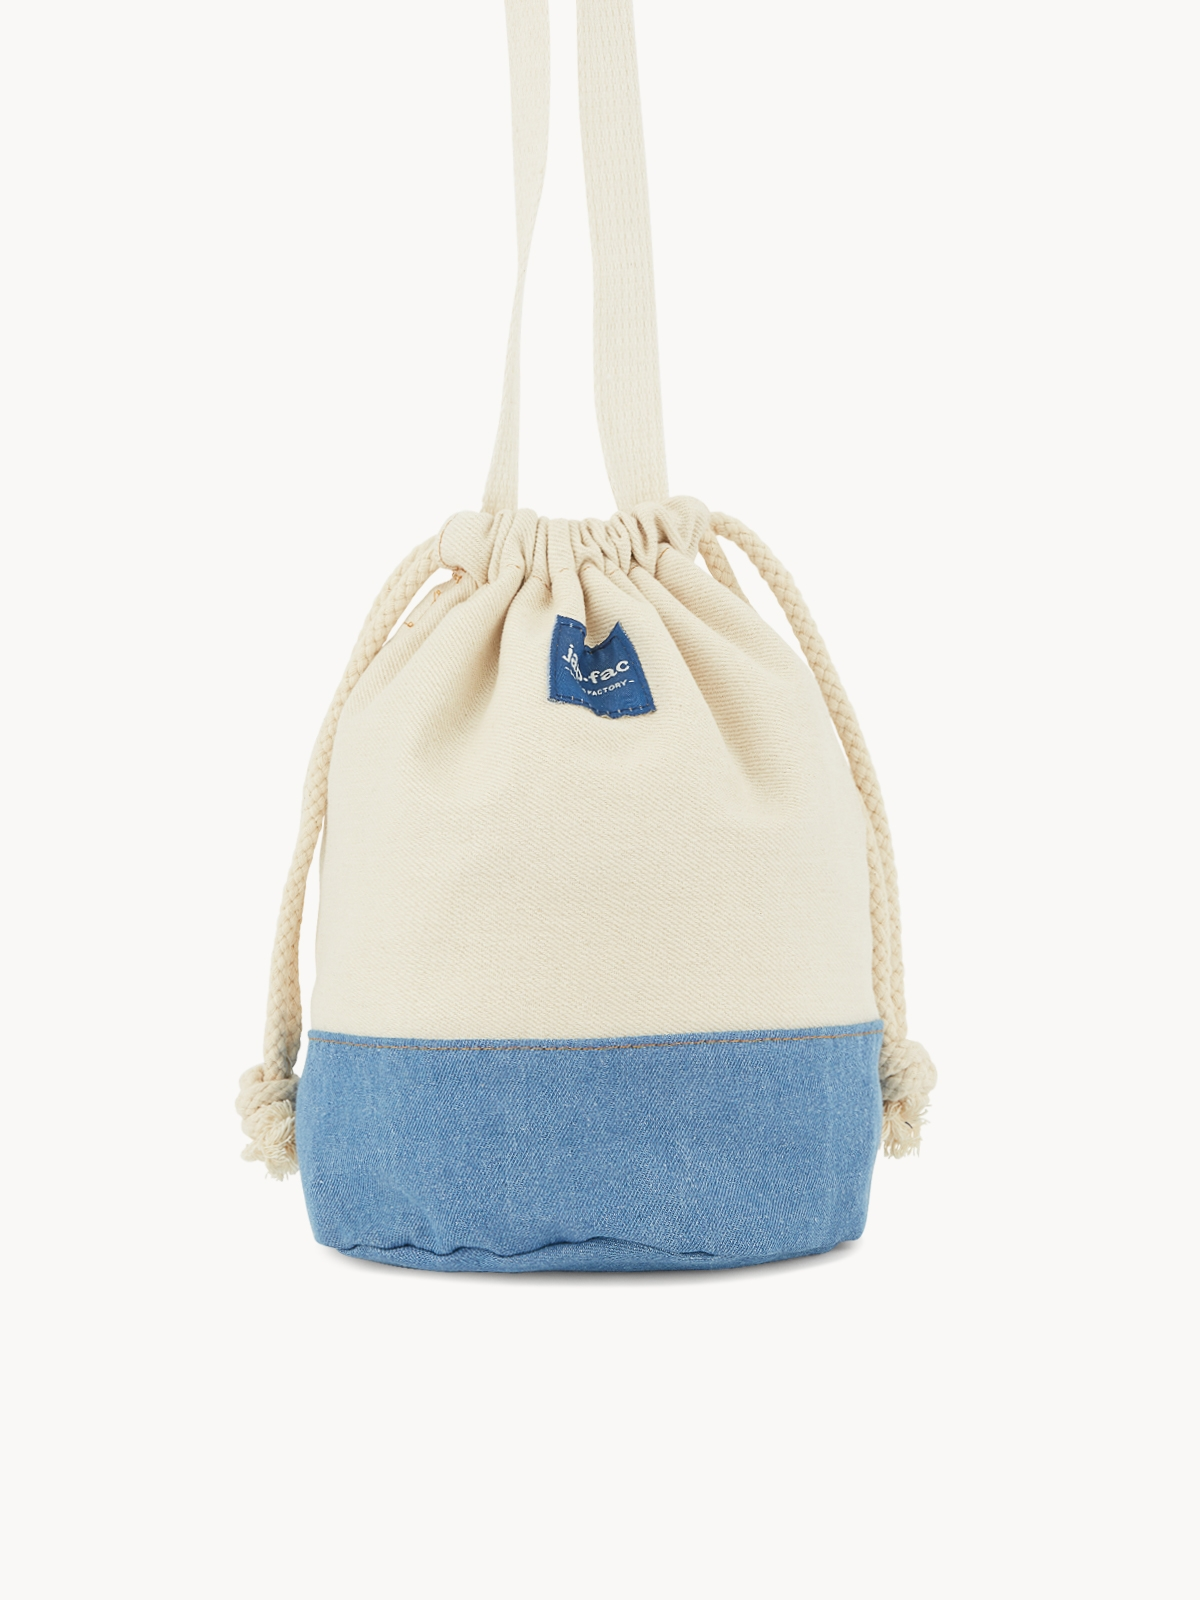 Japfac Two Tone Mini Bucket Blue